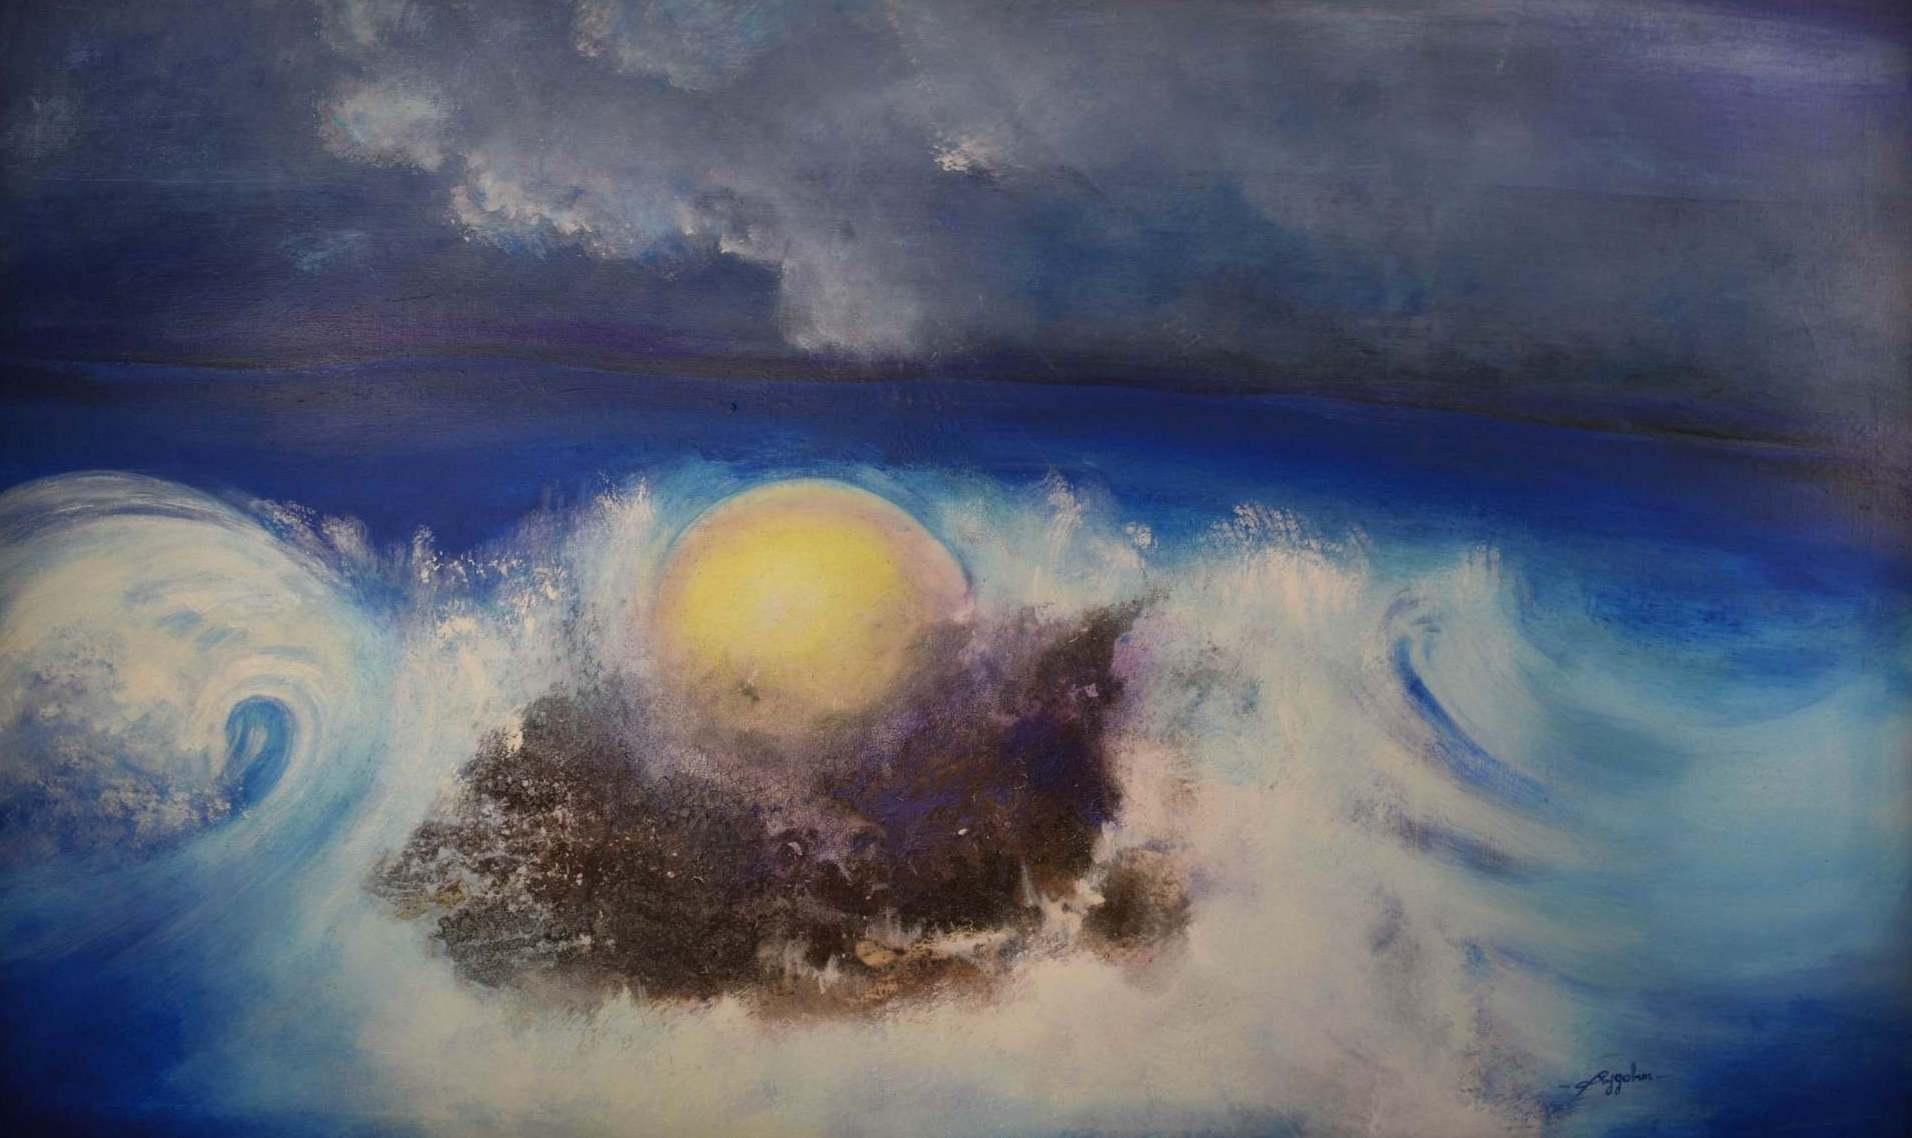 Agbeta hoyo - Acrylique sur toile - 162x100 cm